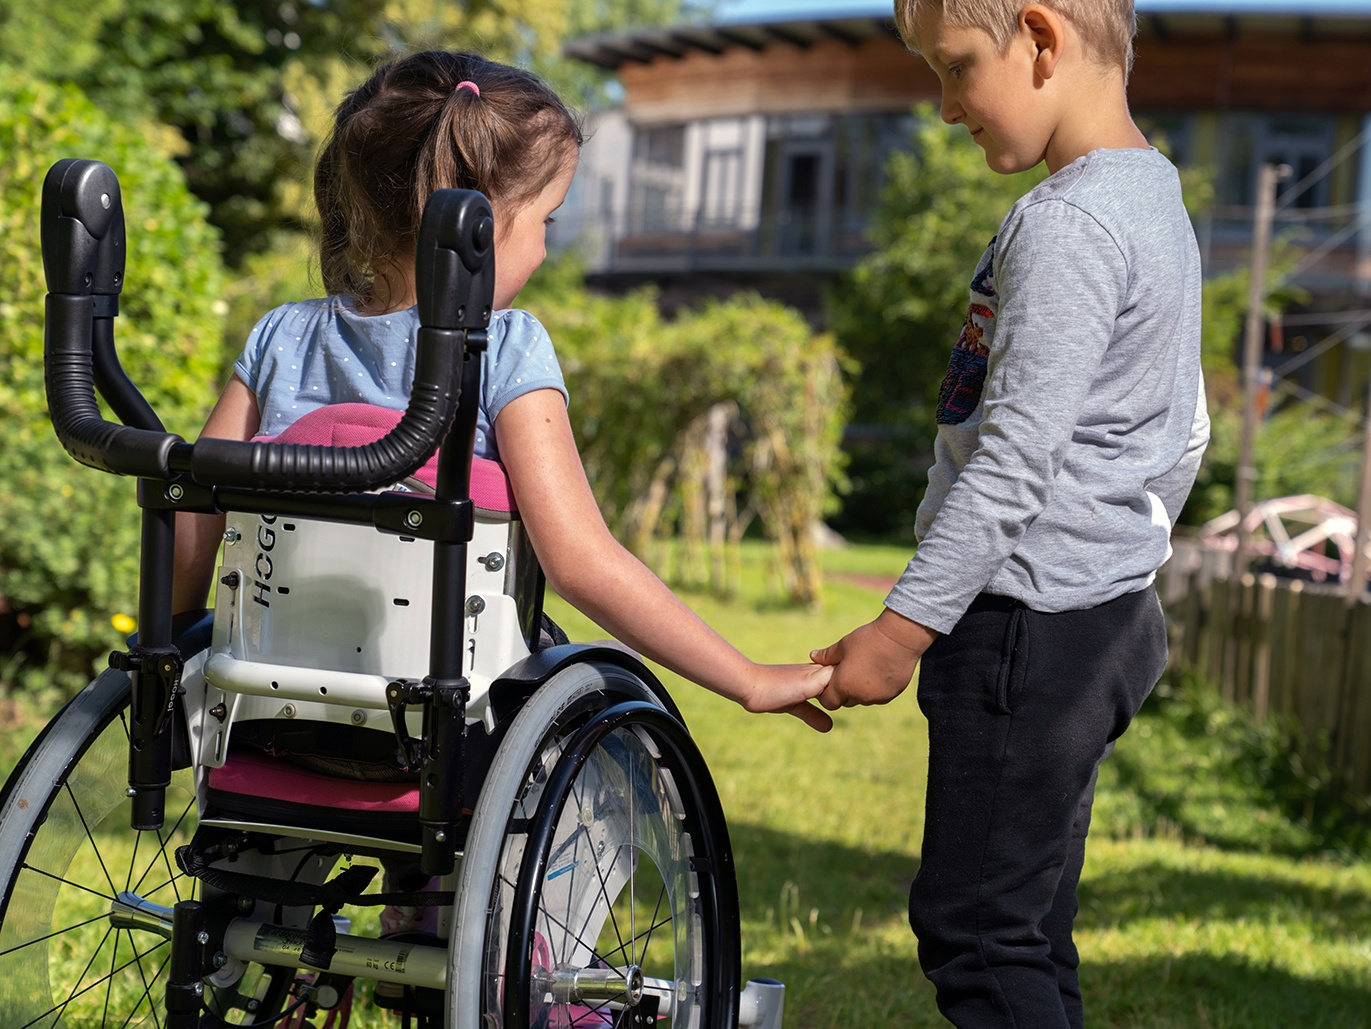 Körperbehinderte Allgäu mit einer Dauerspende fördern